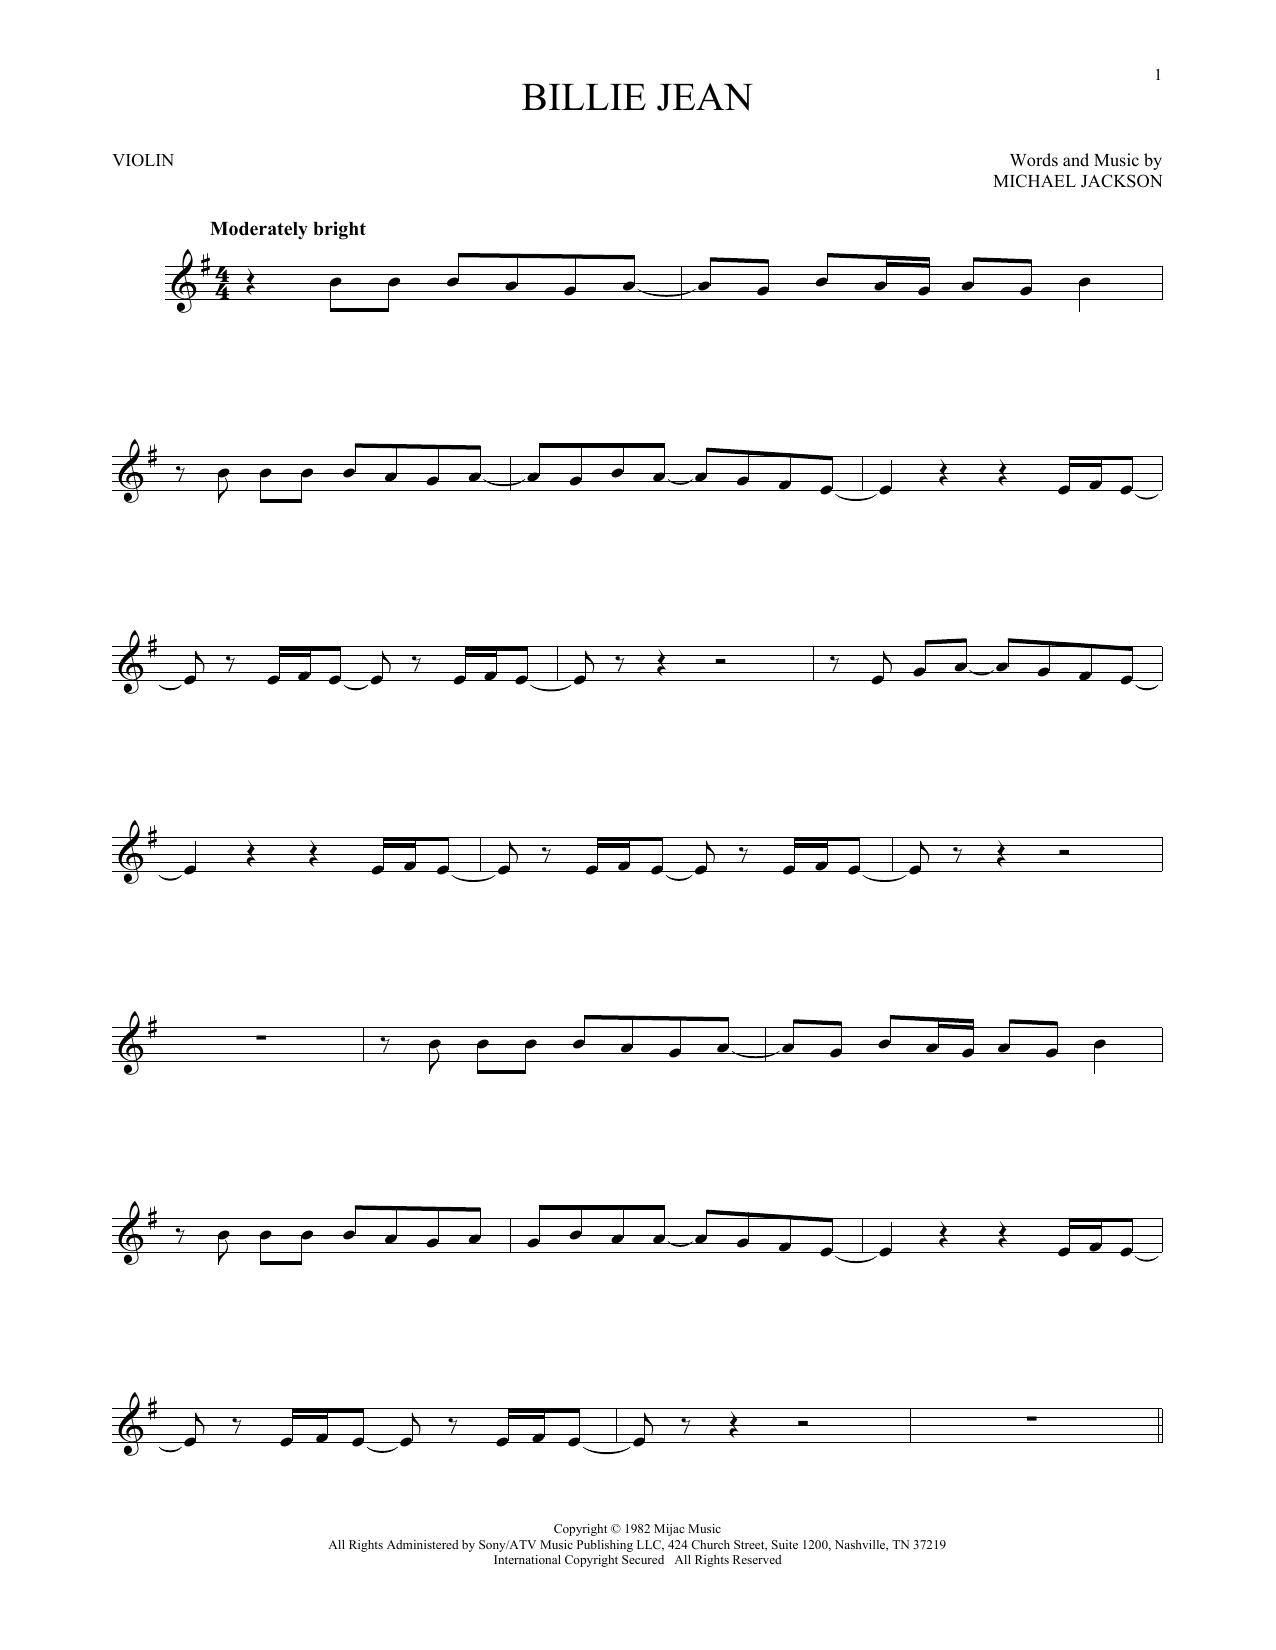 Billie Jean (Violin Solo)